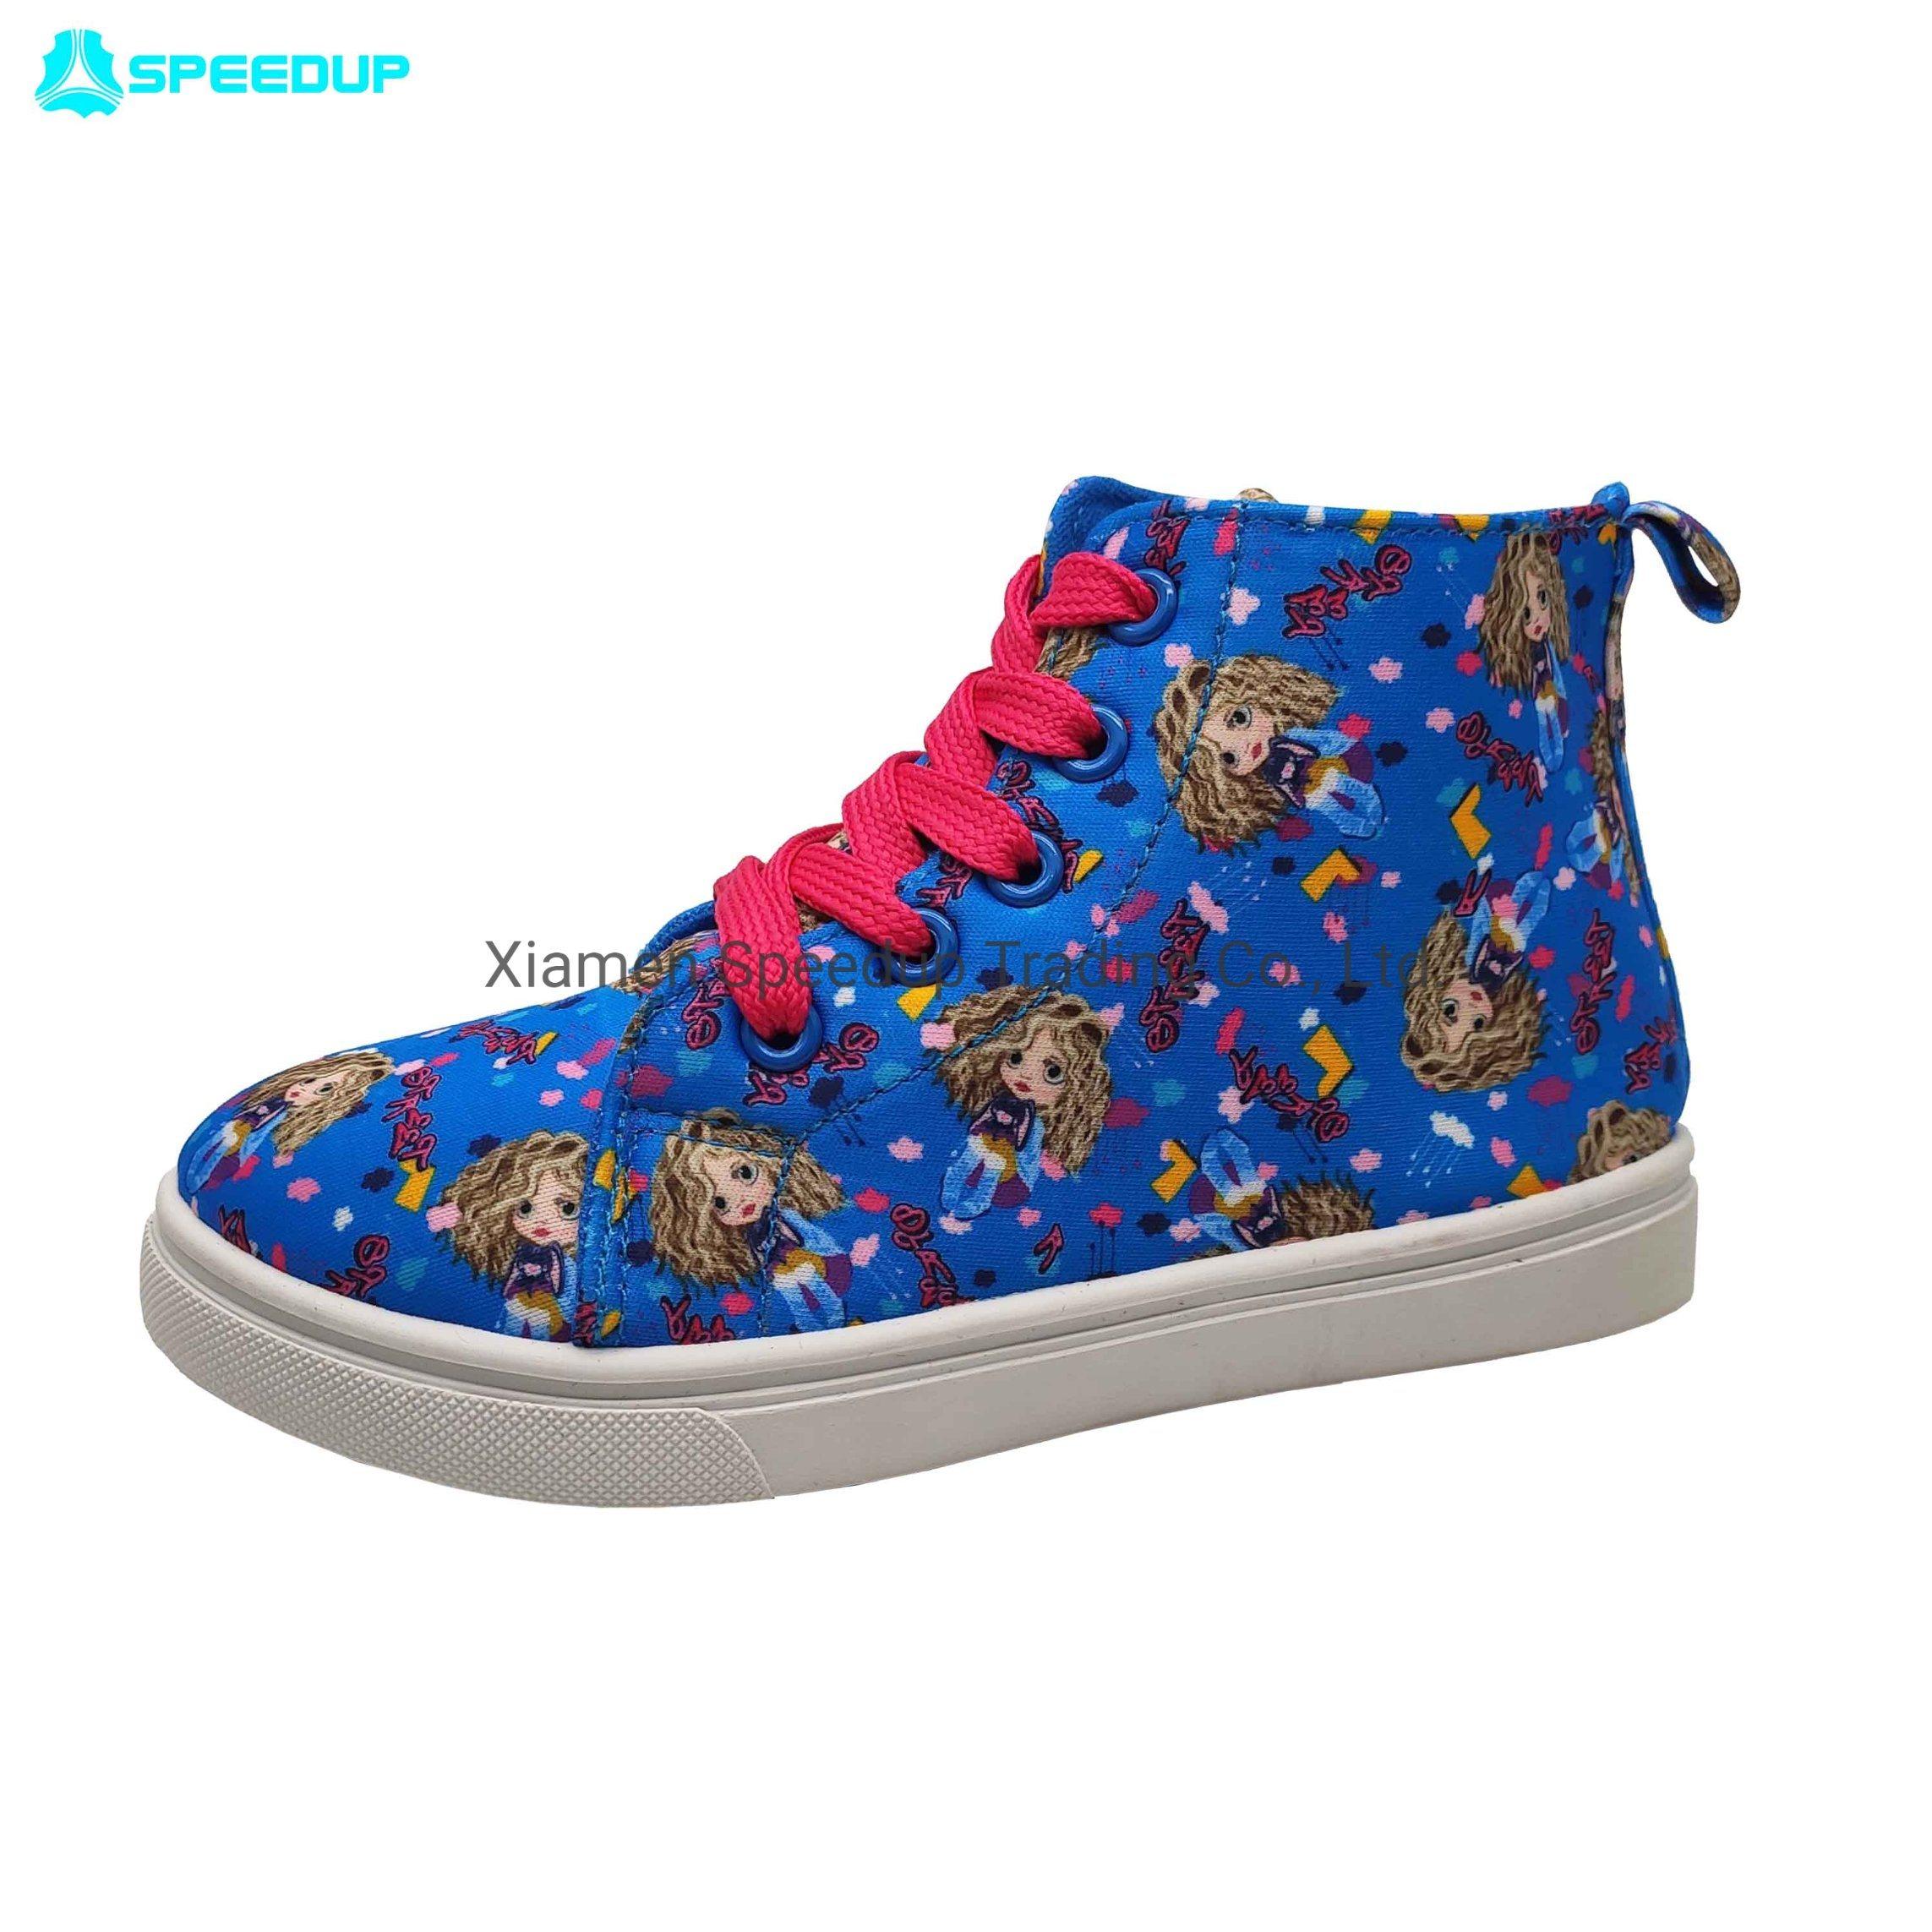 China Hot Selling Fashion Kids Shoes